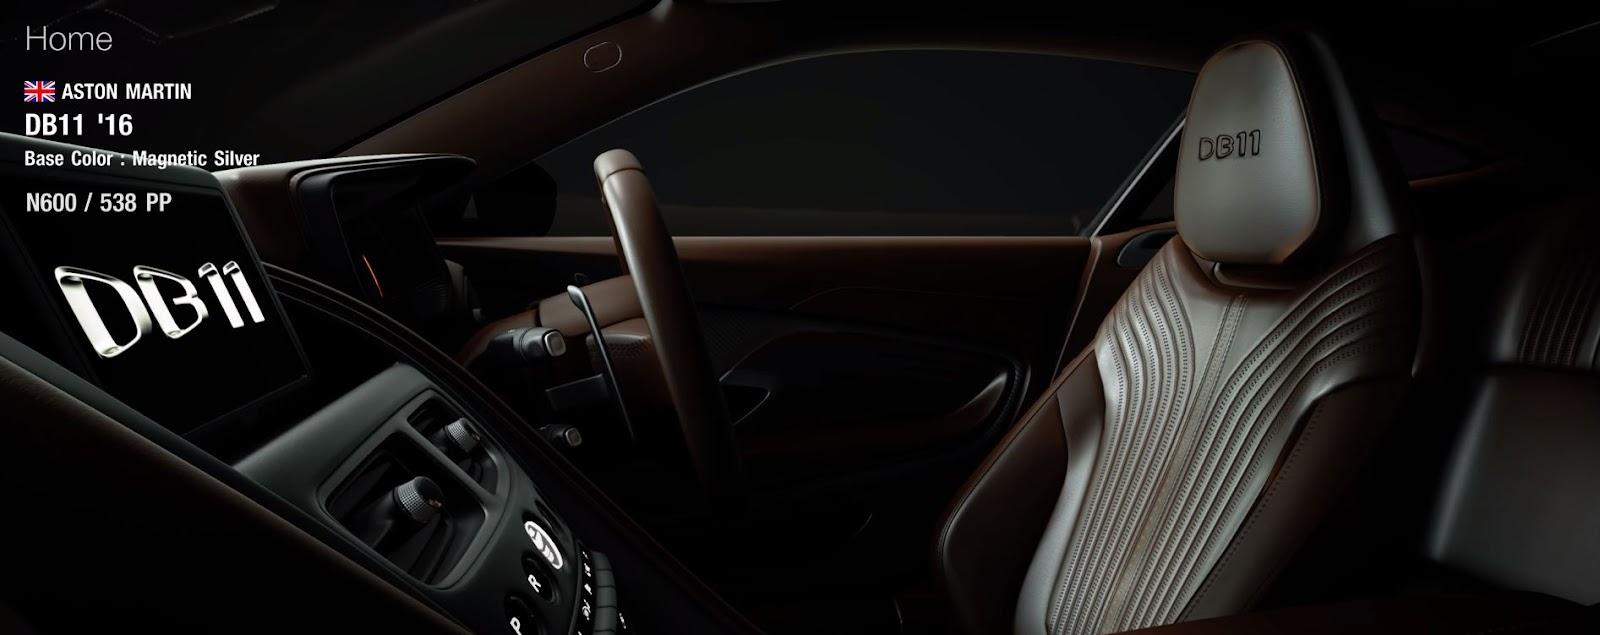 Gran Turismo 7 Aston Martin DB11 Interior